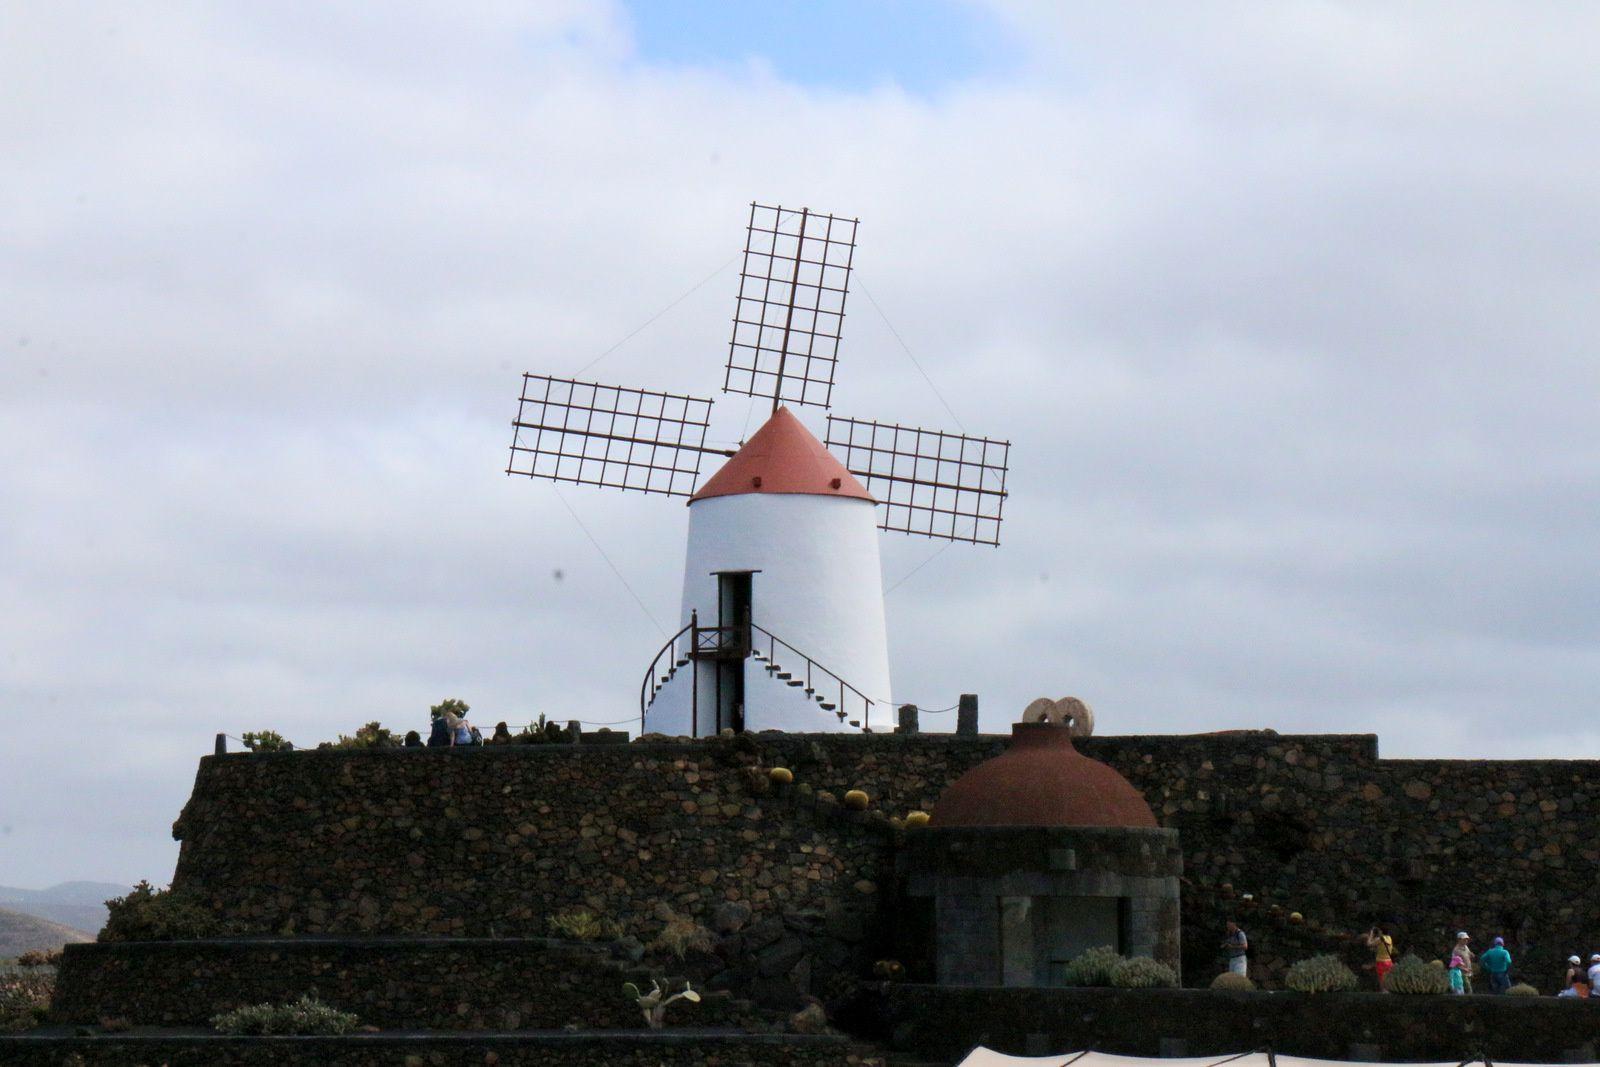 Le moulin du Jardin de Cactus, île de Lanzarote (Canaries)